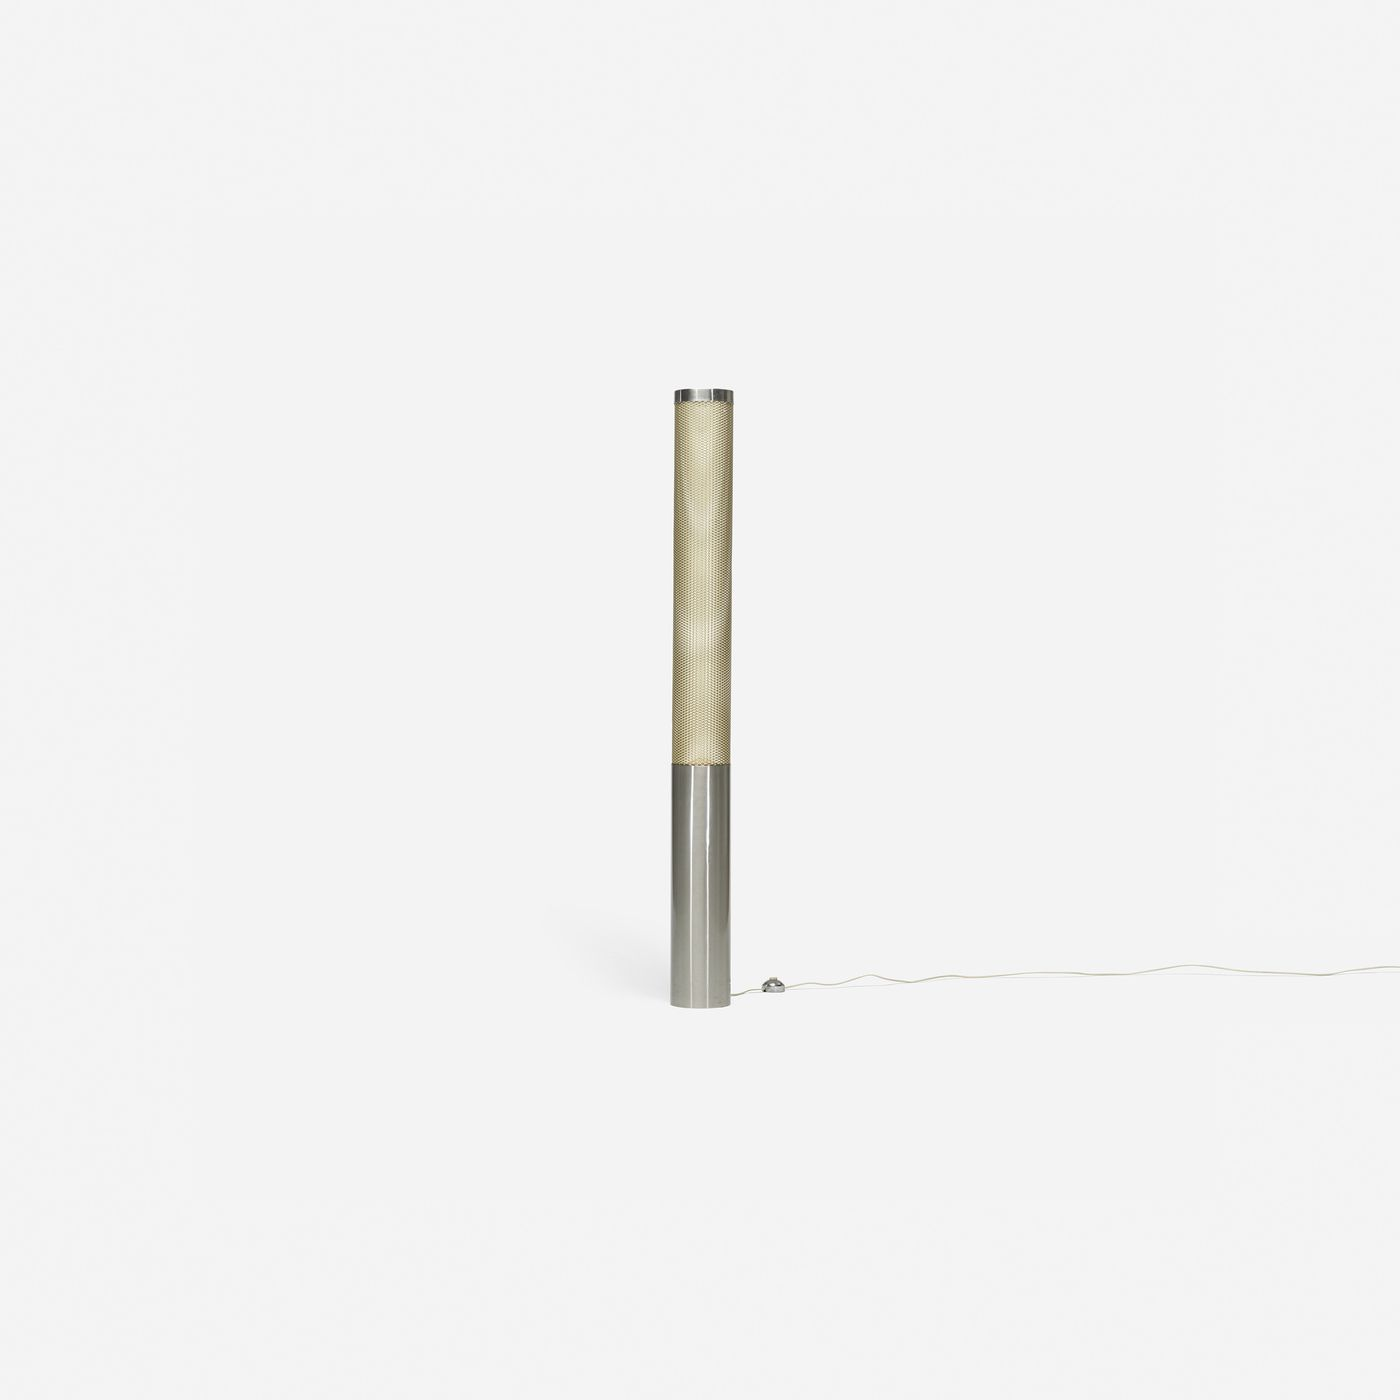 253: Gio Ponti / floor lamp < Design, 23 October 2014 < Auctions   Wright